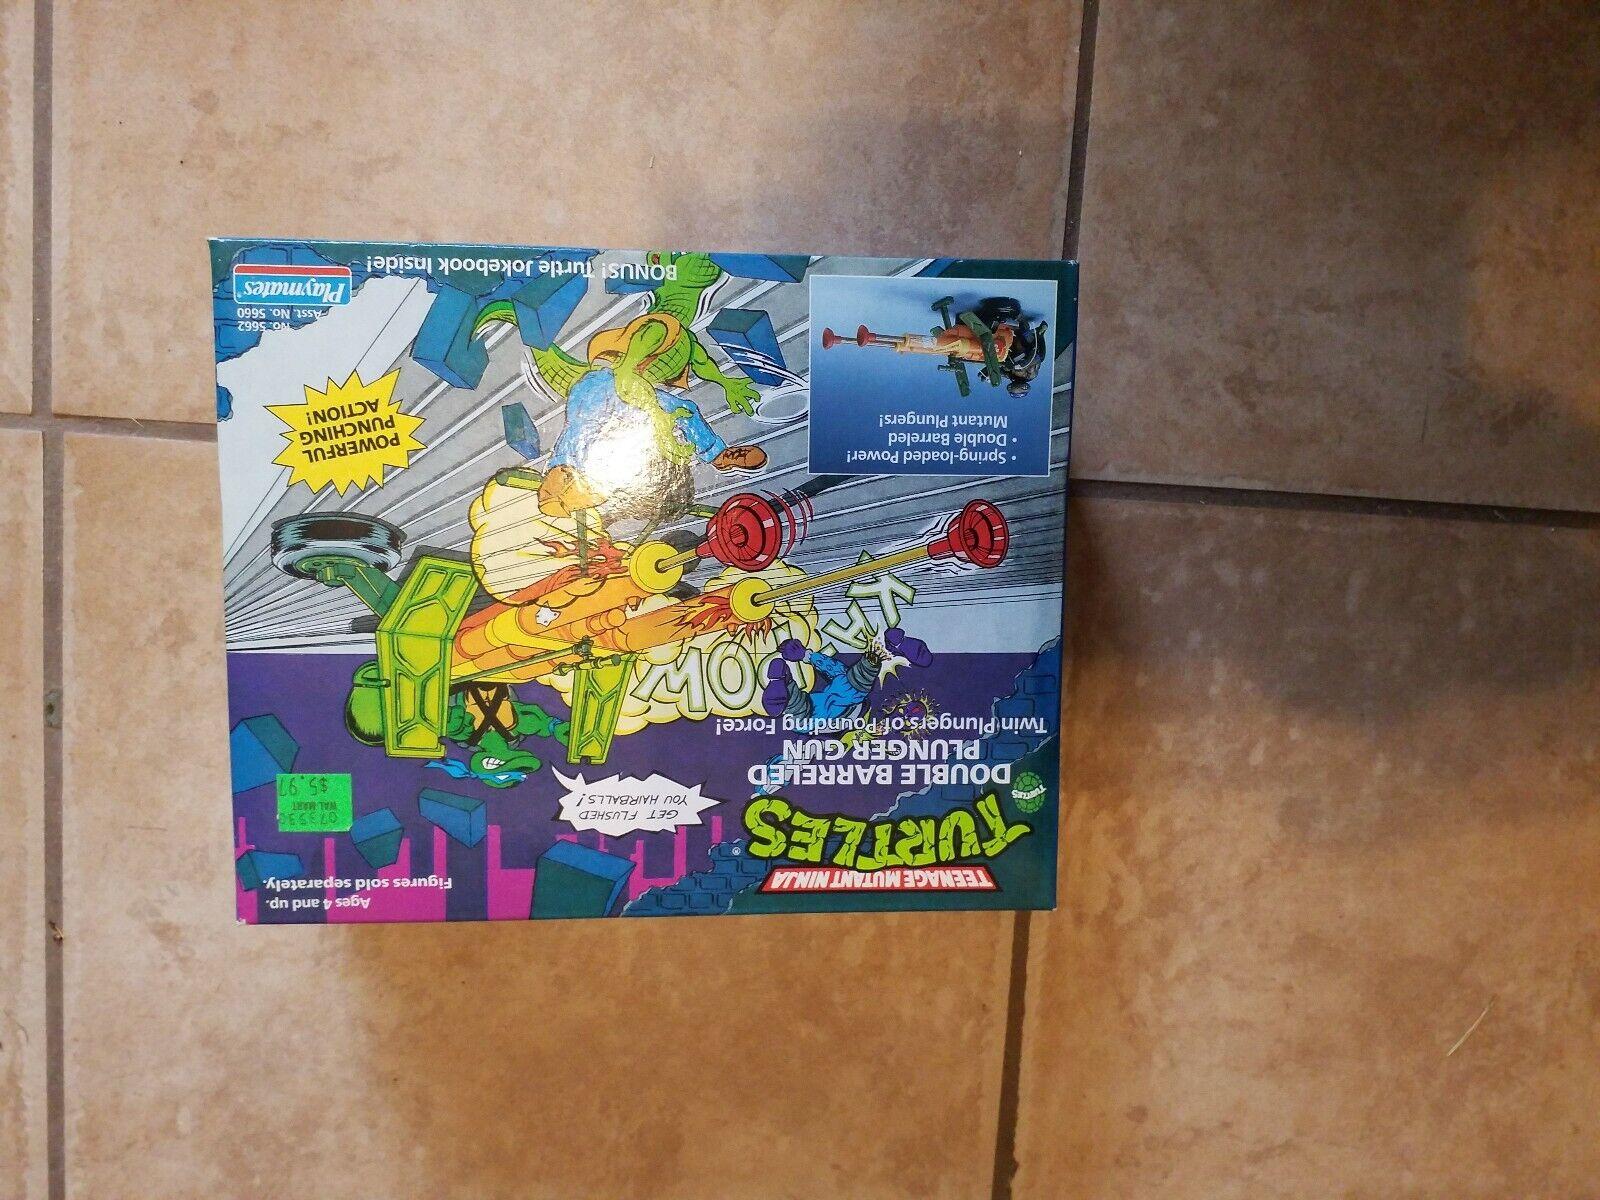 Doppio Barreled Plunger Gun Play Set 1989 TMNT Teenage Mutant  Ninja Turtles  confortevole